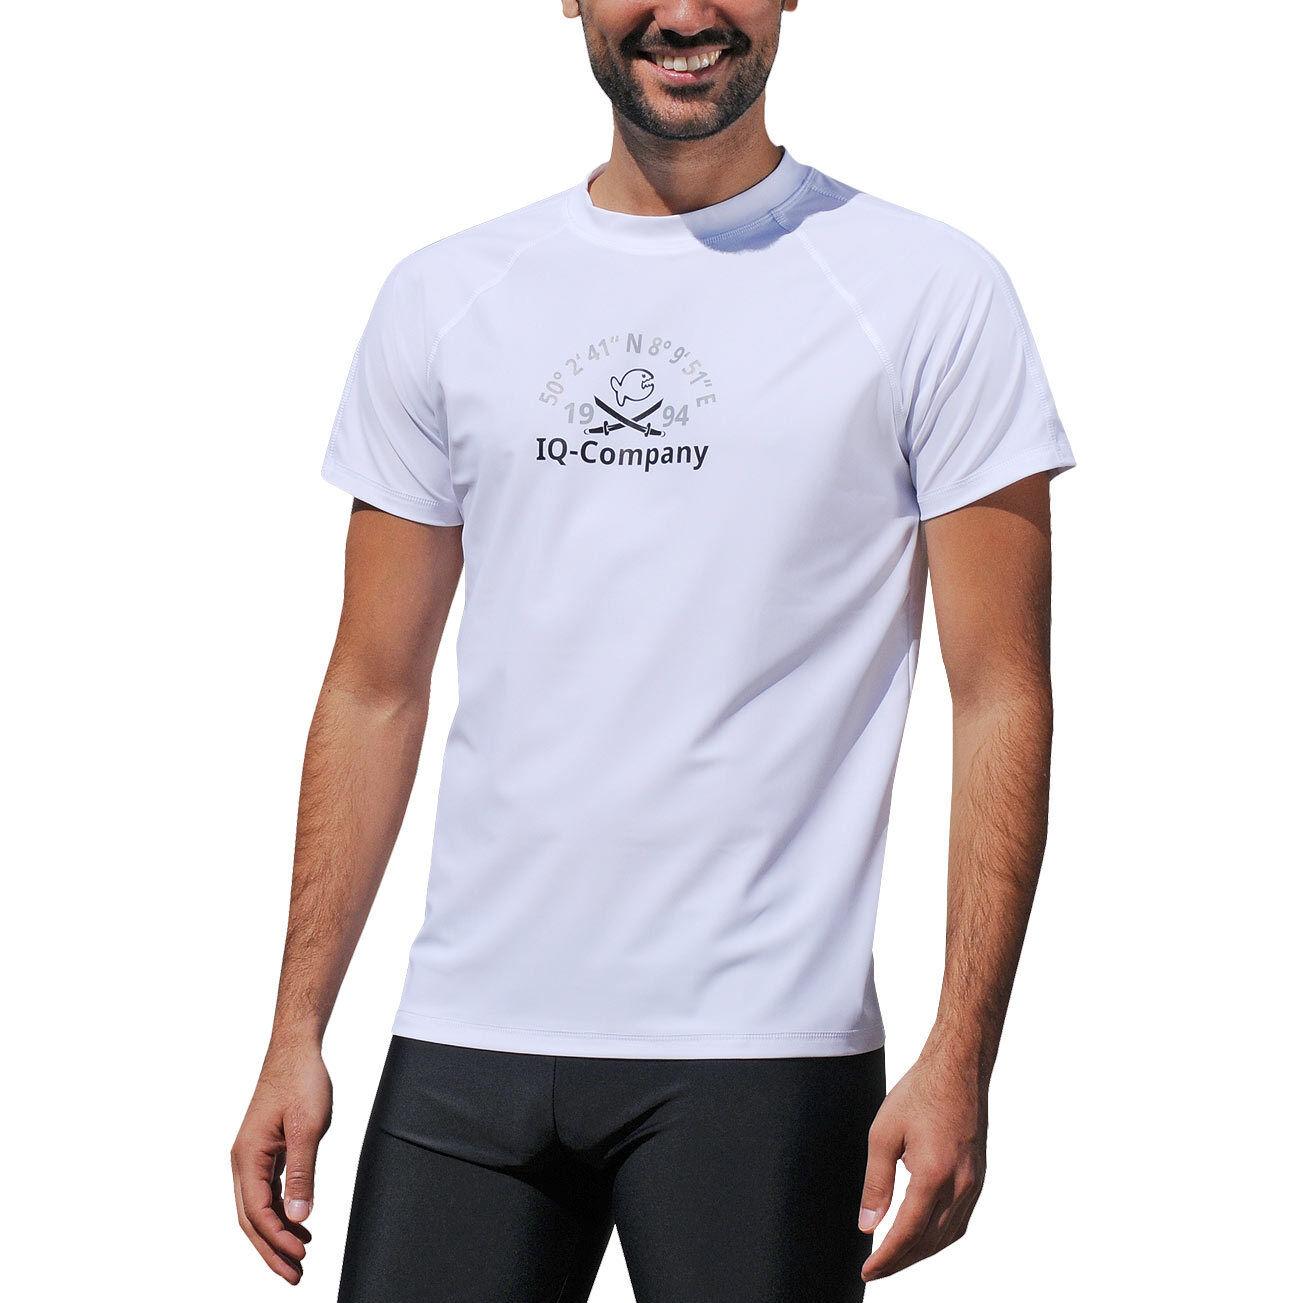 IQ UV 300 Shirt Loose Loose Loose Fit Men Herren S - 3XL Weiß weiss Schutz Bekleidung 1994 09cd63